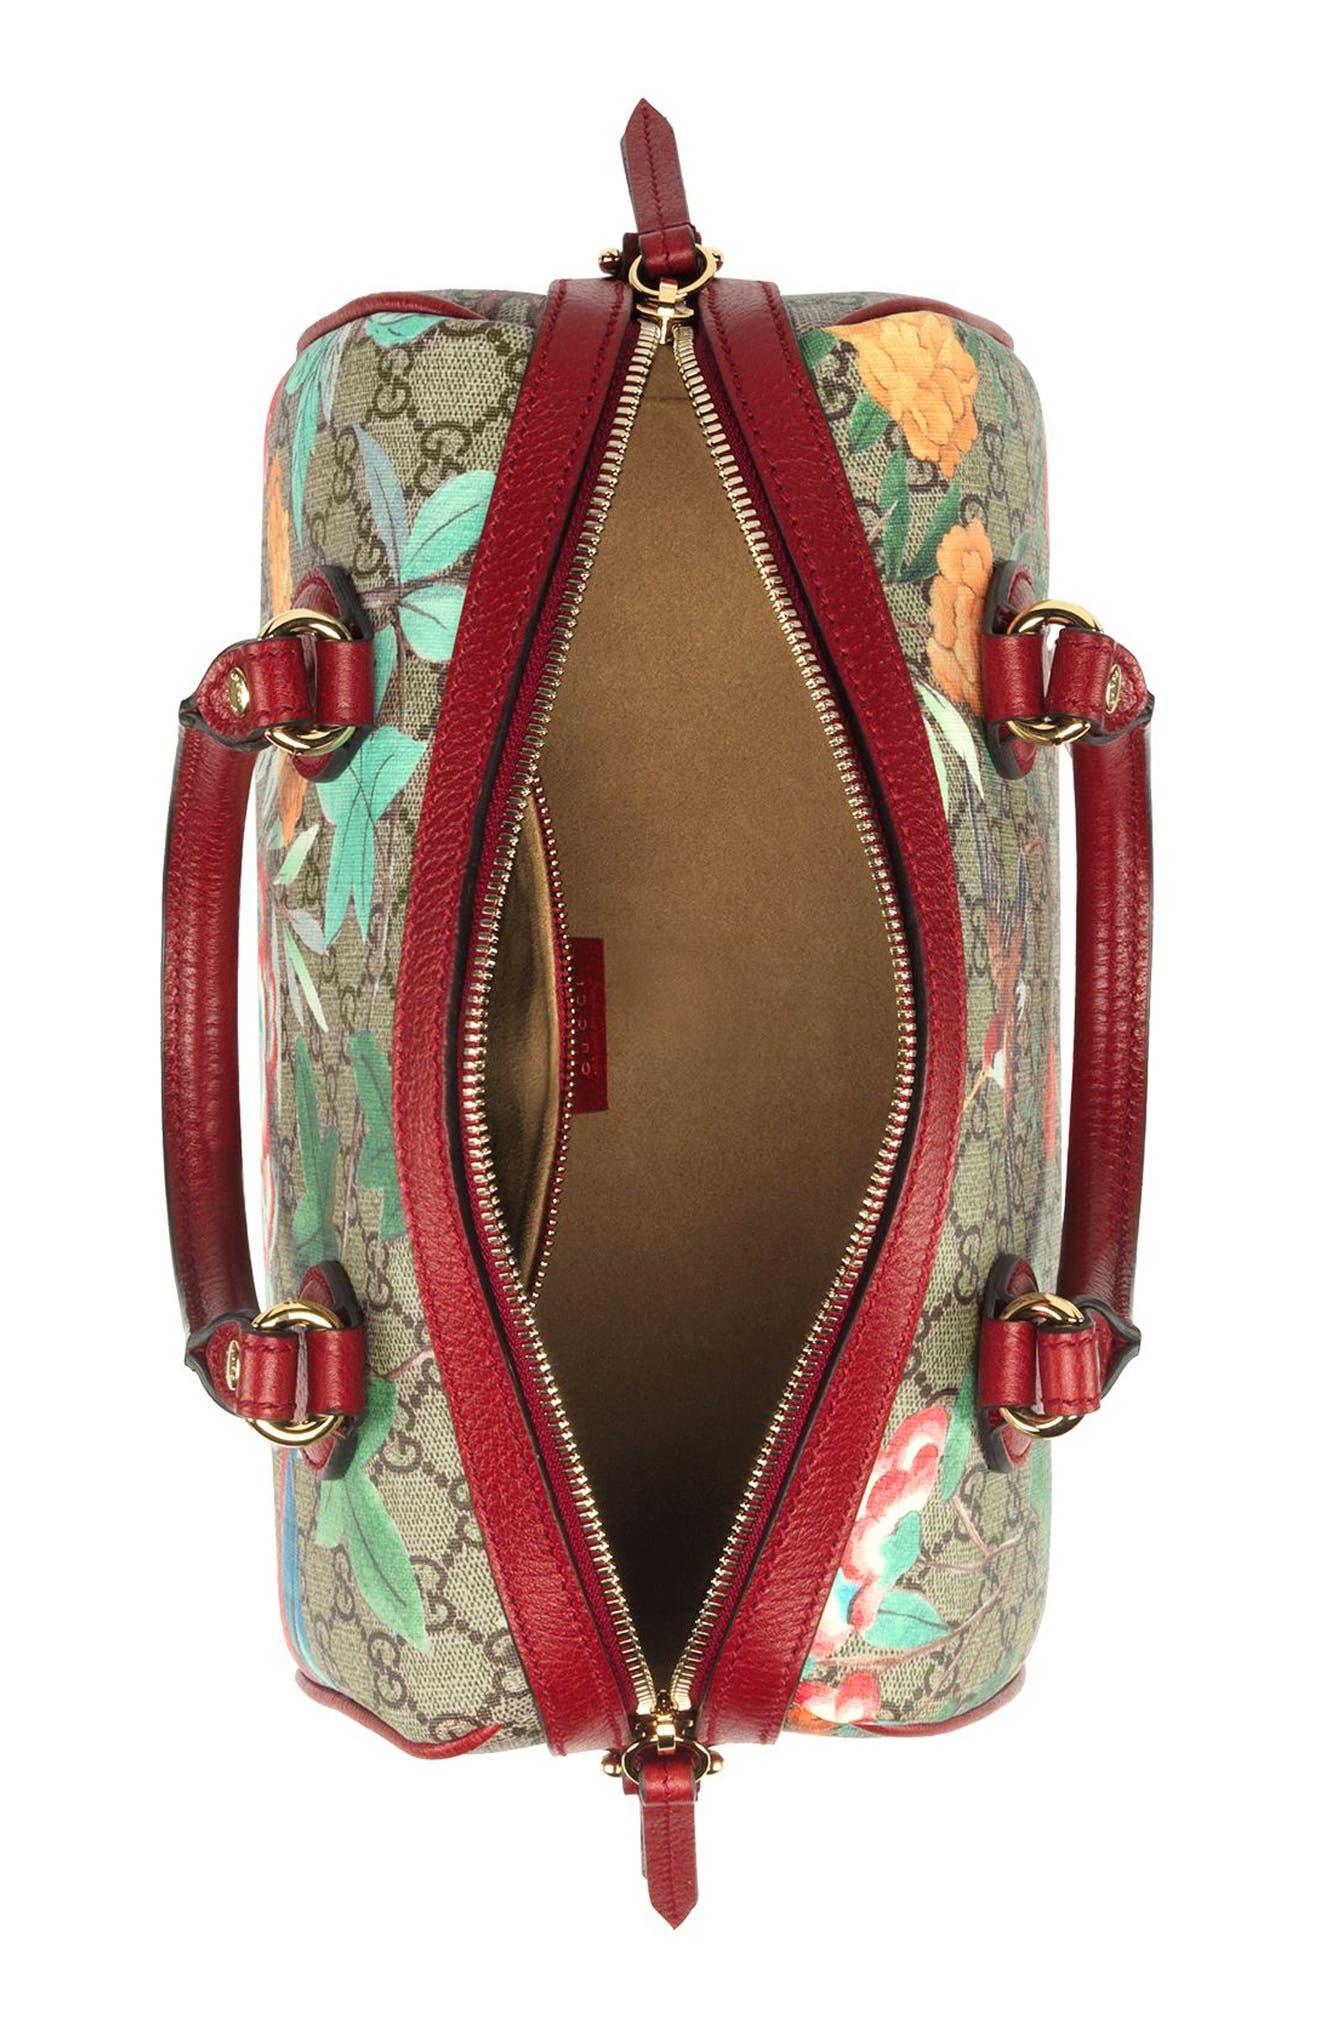 Tian Boston GG Supreme Small Canvas Duffel Bag,                             Alternate thumbnail 3, color,